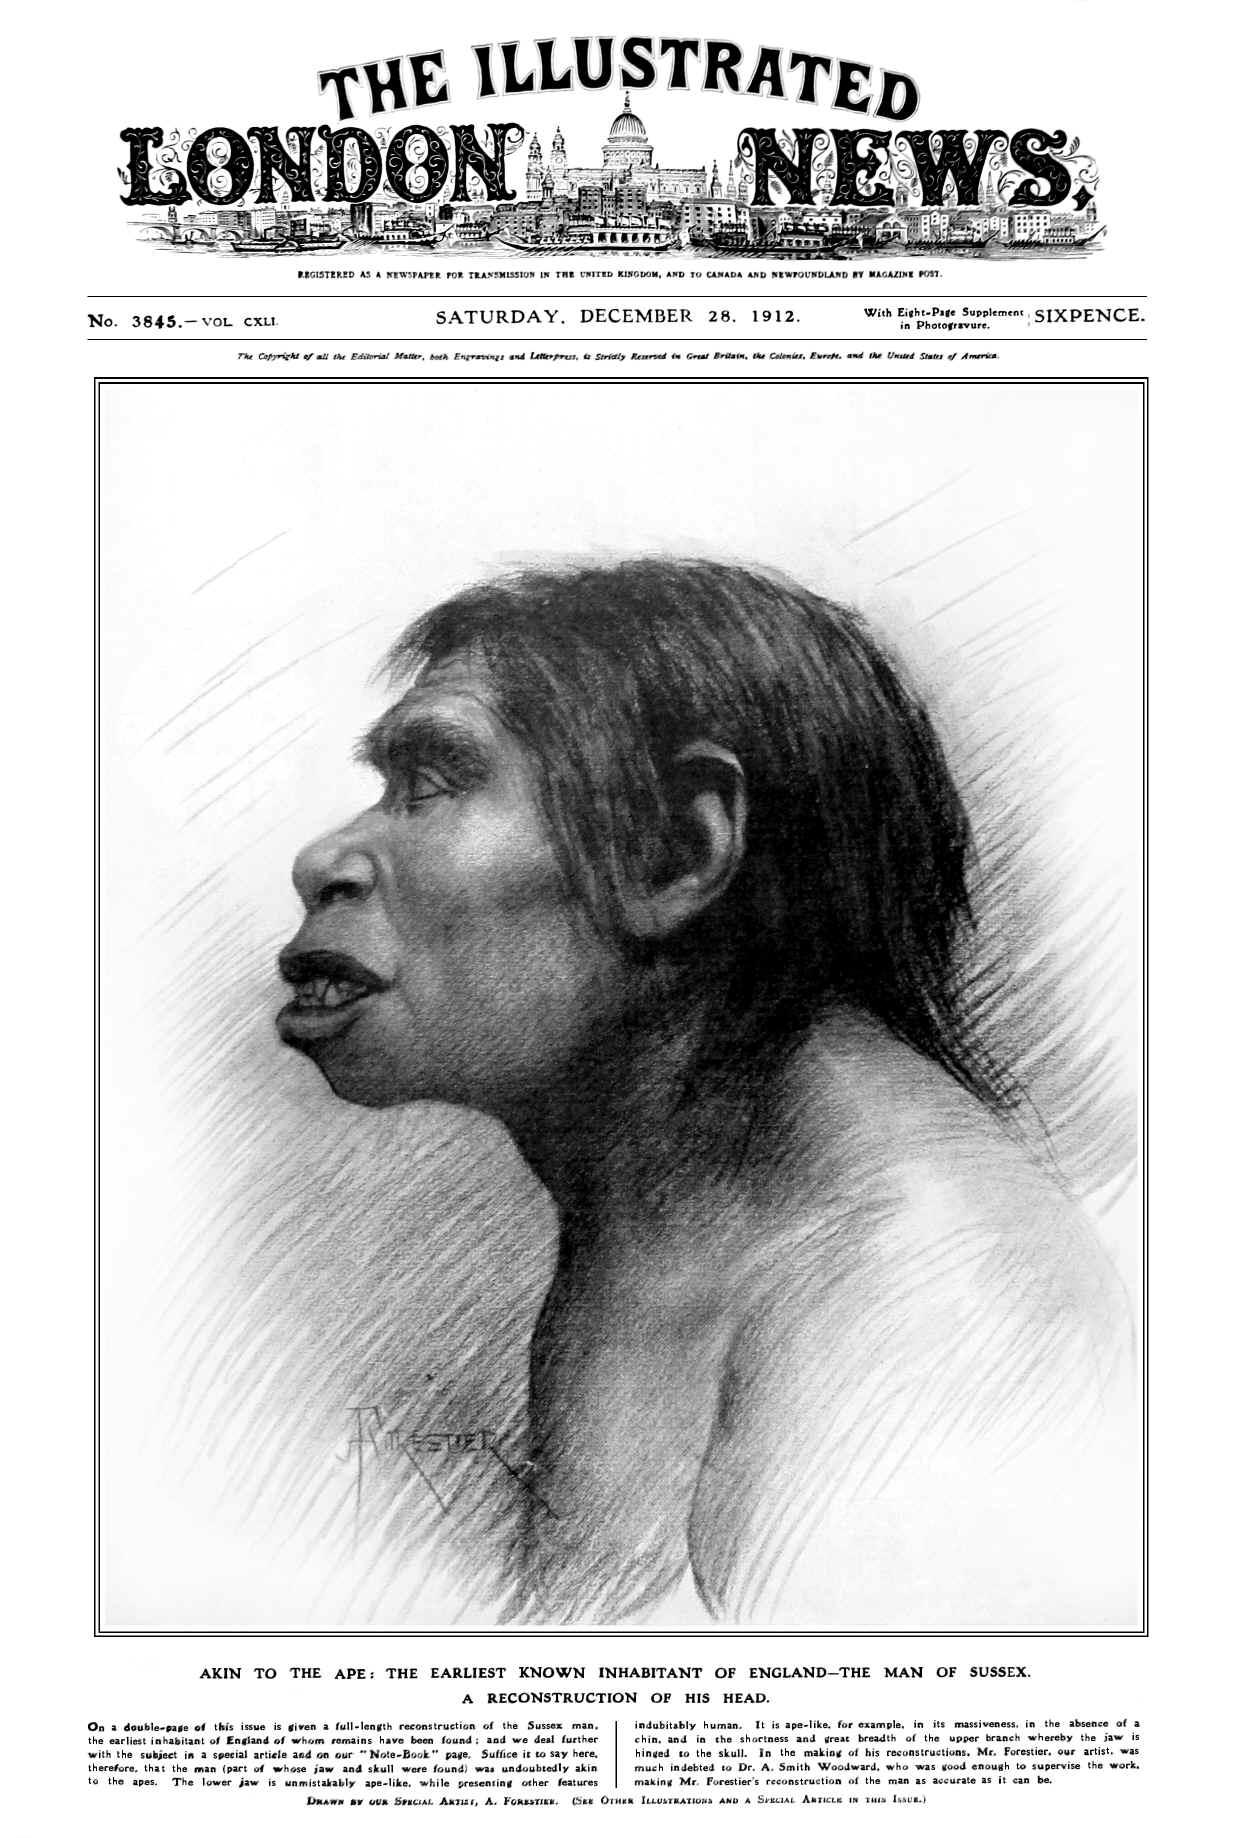 Piltdown in Illustrated London News